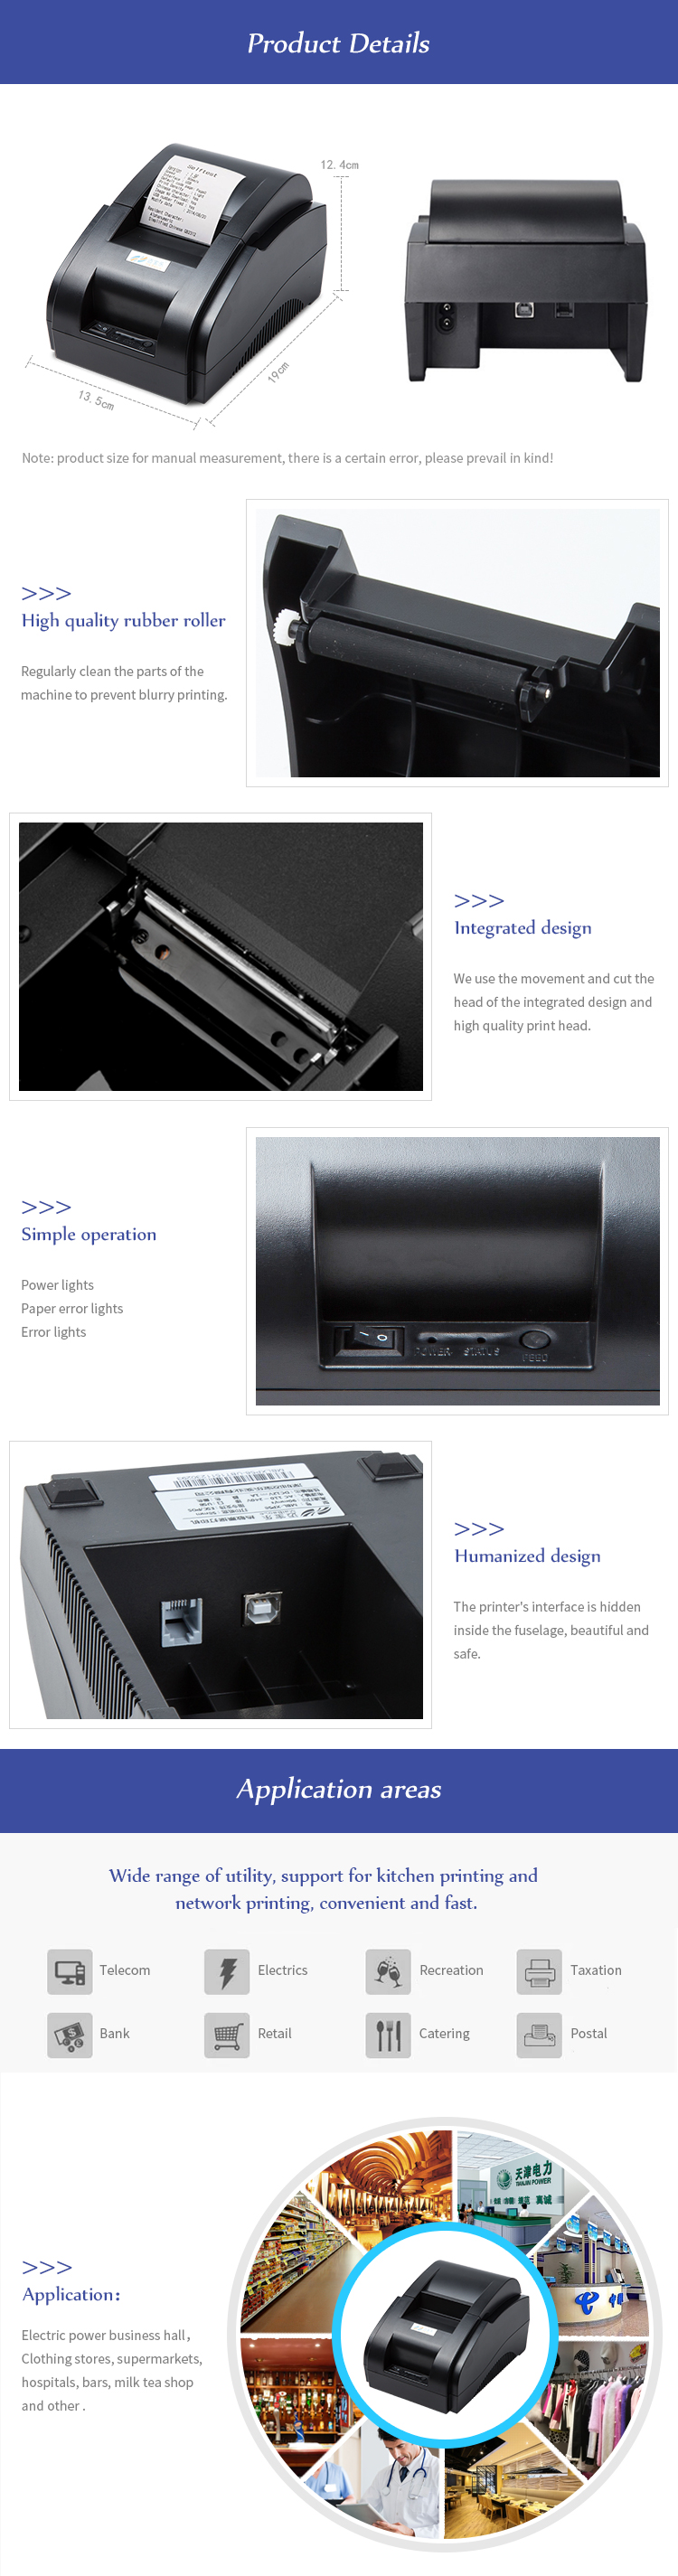 MBL-XP58-USB.jpg